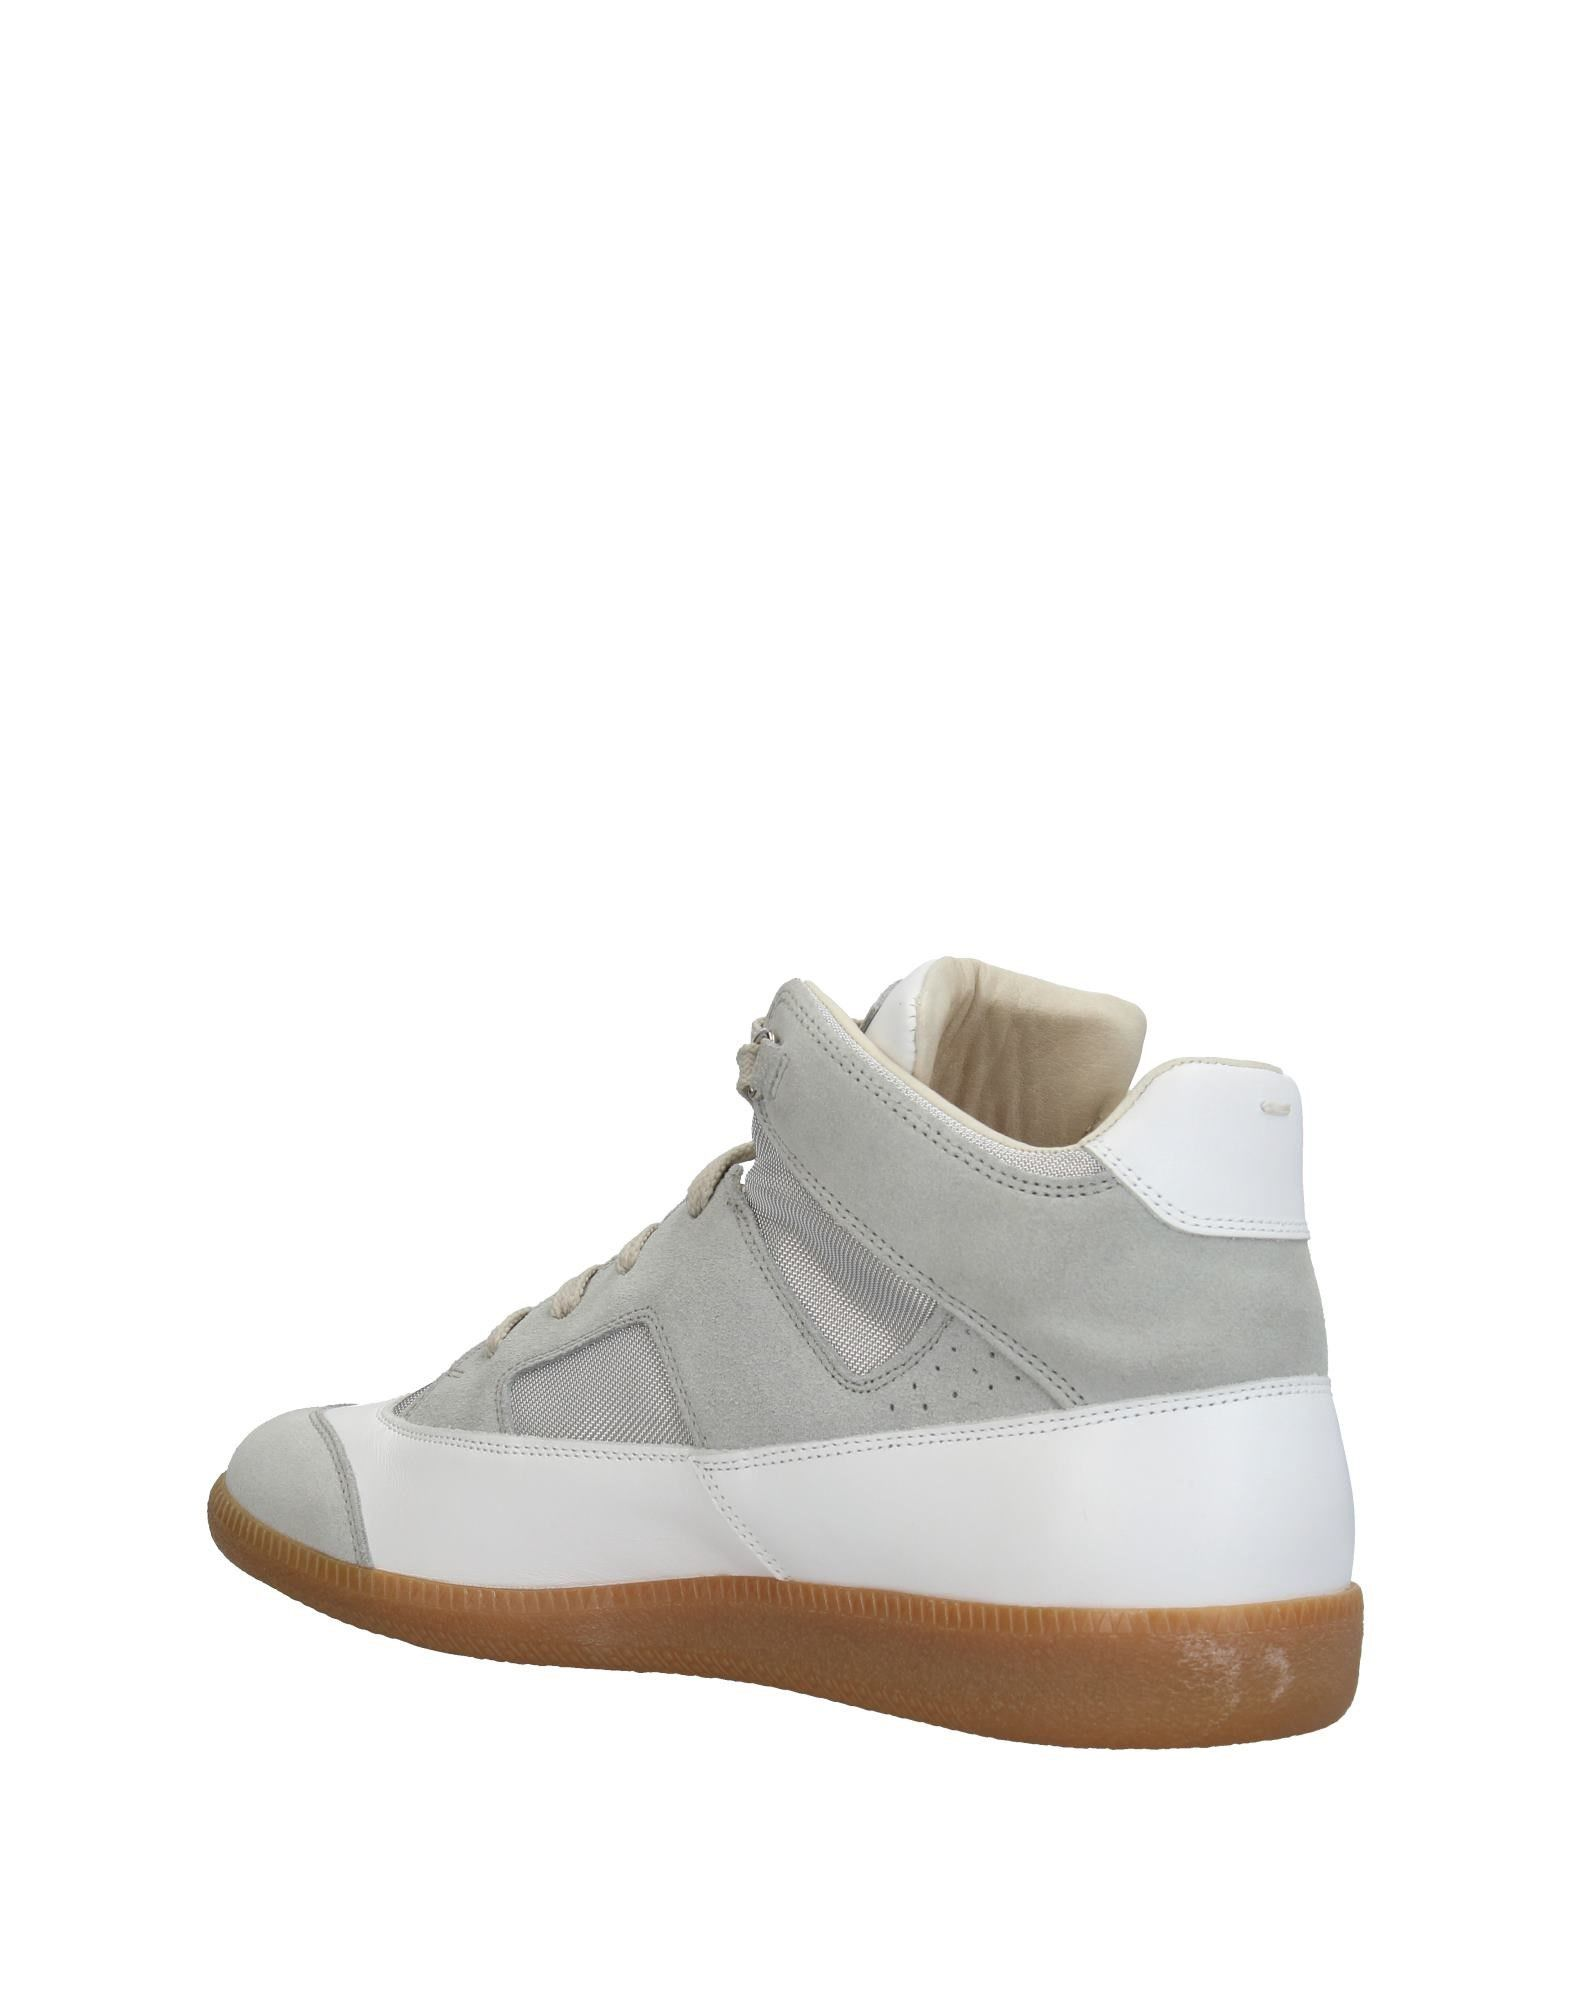 Sneakers Maison 11385087BS Margiela Uomo - 11385087BS Maison 359b6b